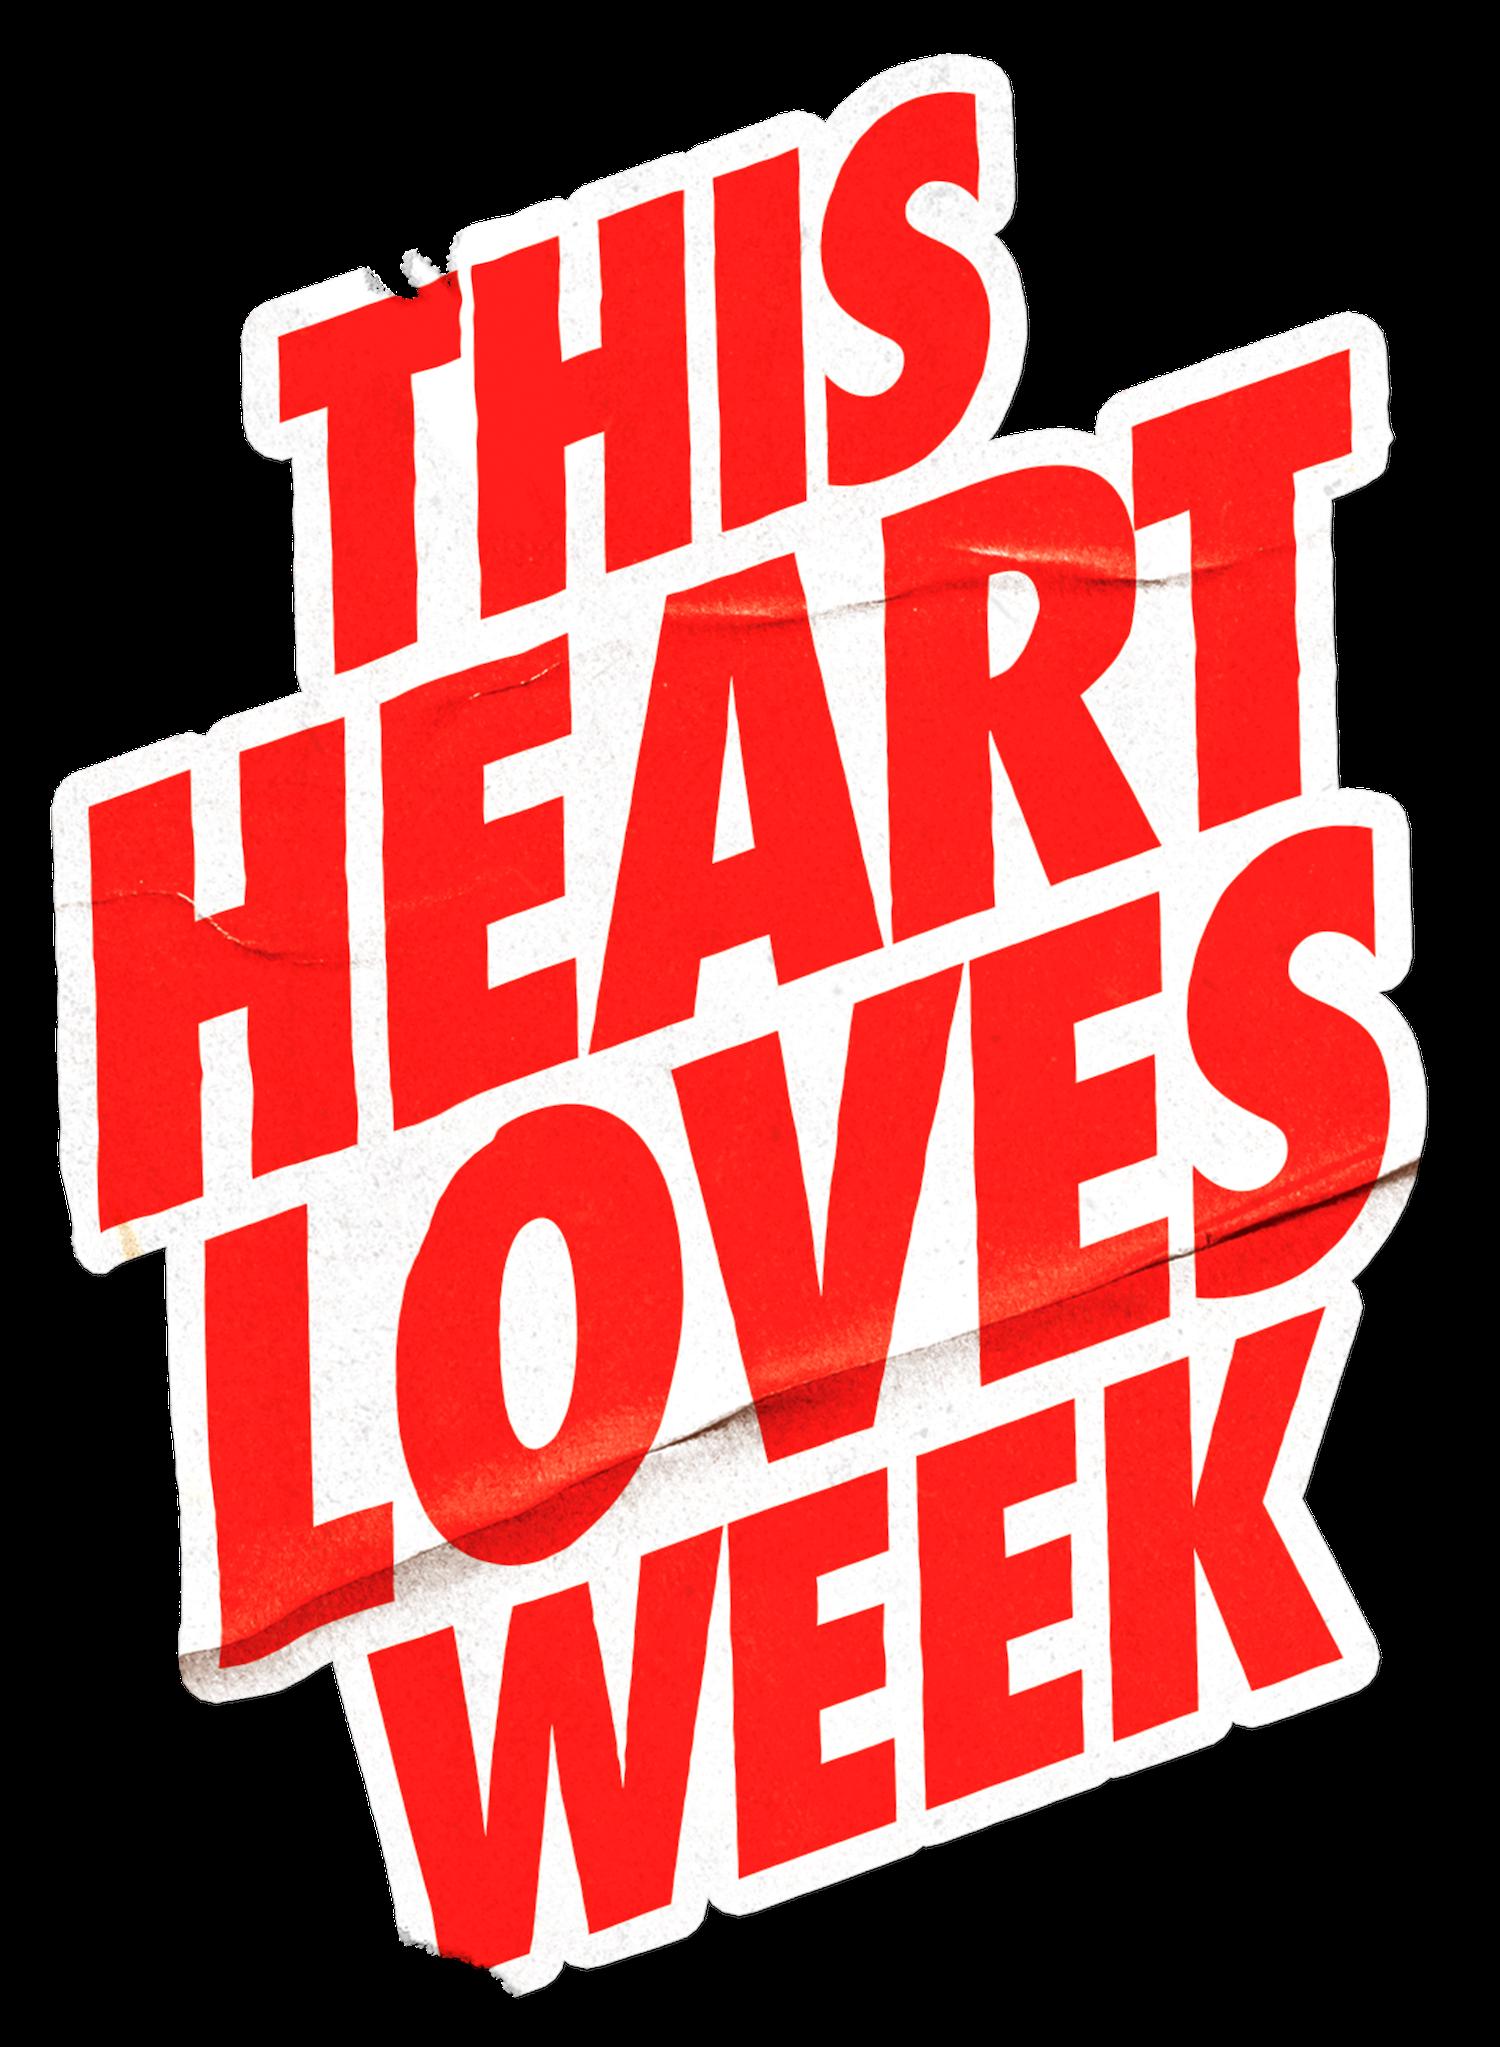 This Heart Loves Week